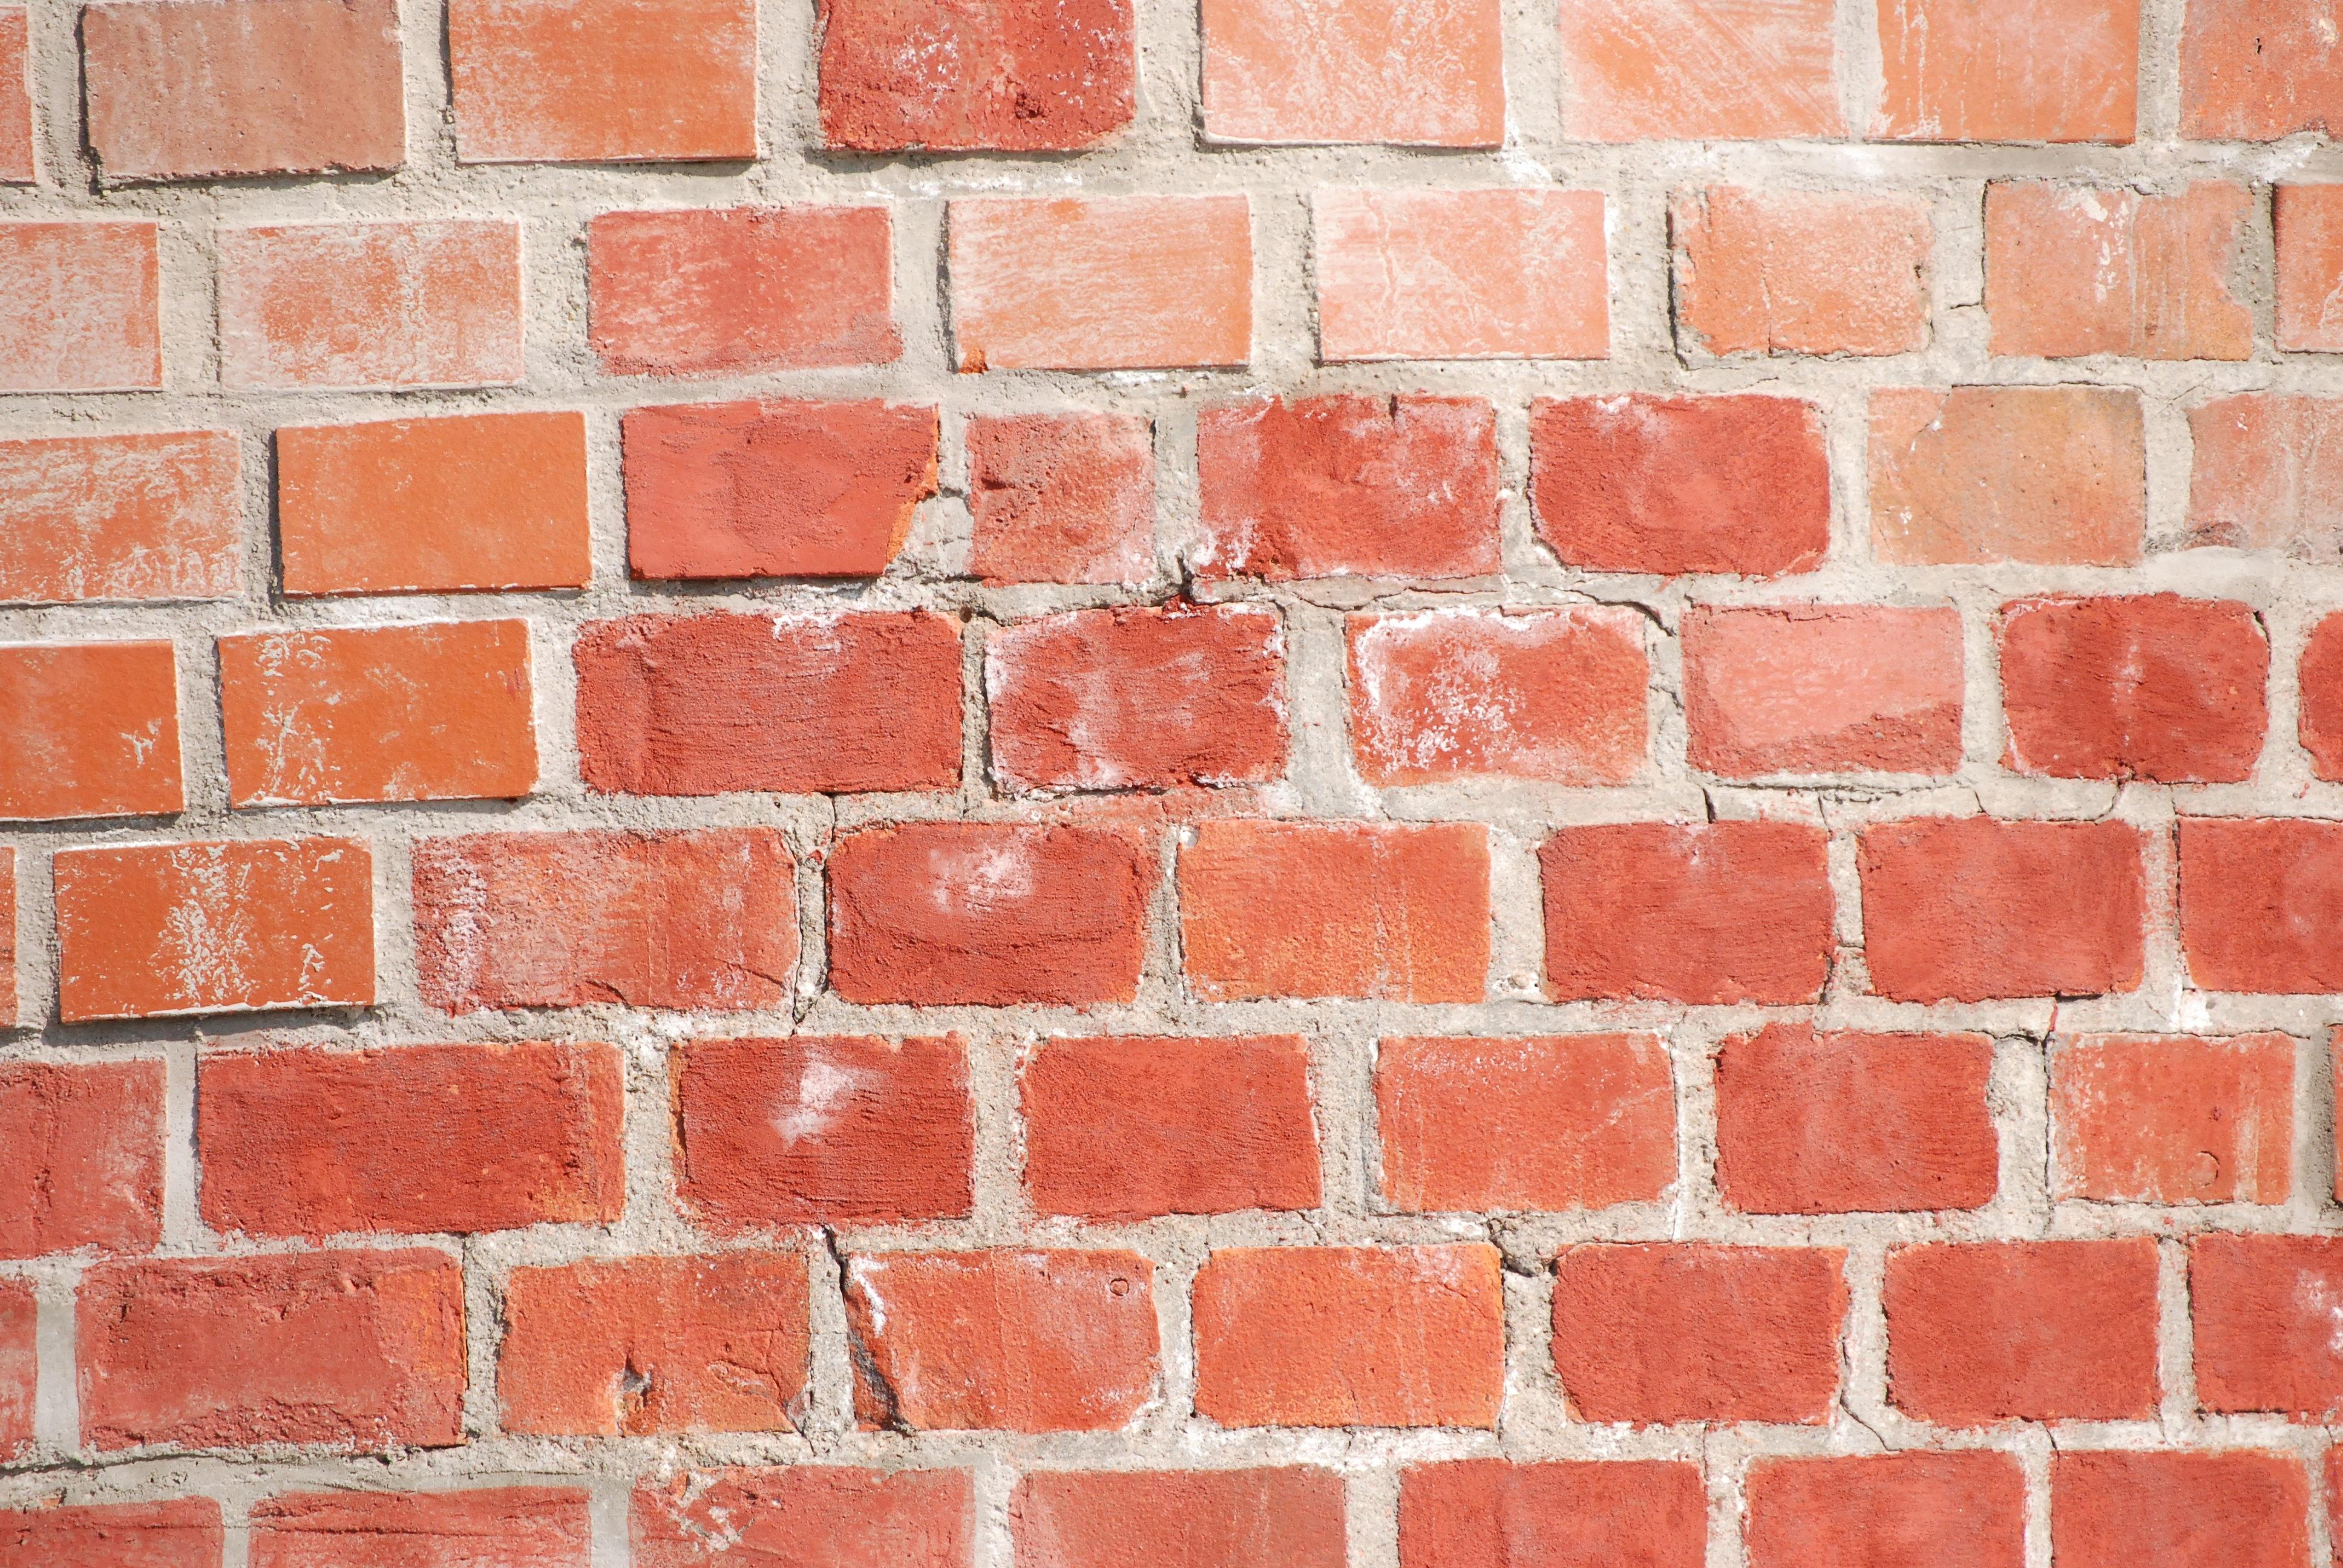 fotos gratis : textura, piso, patrón, rojo, material, pared de